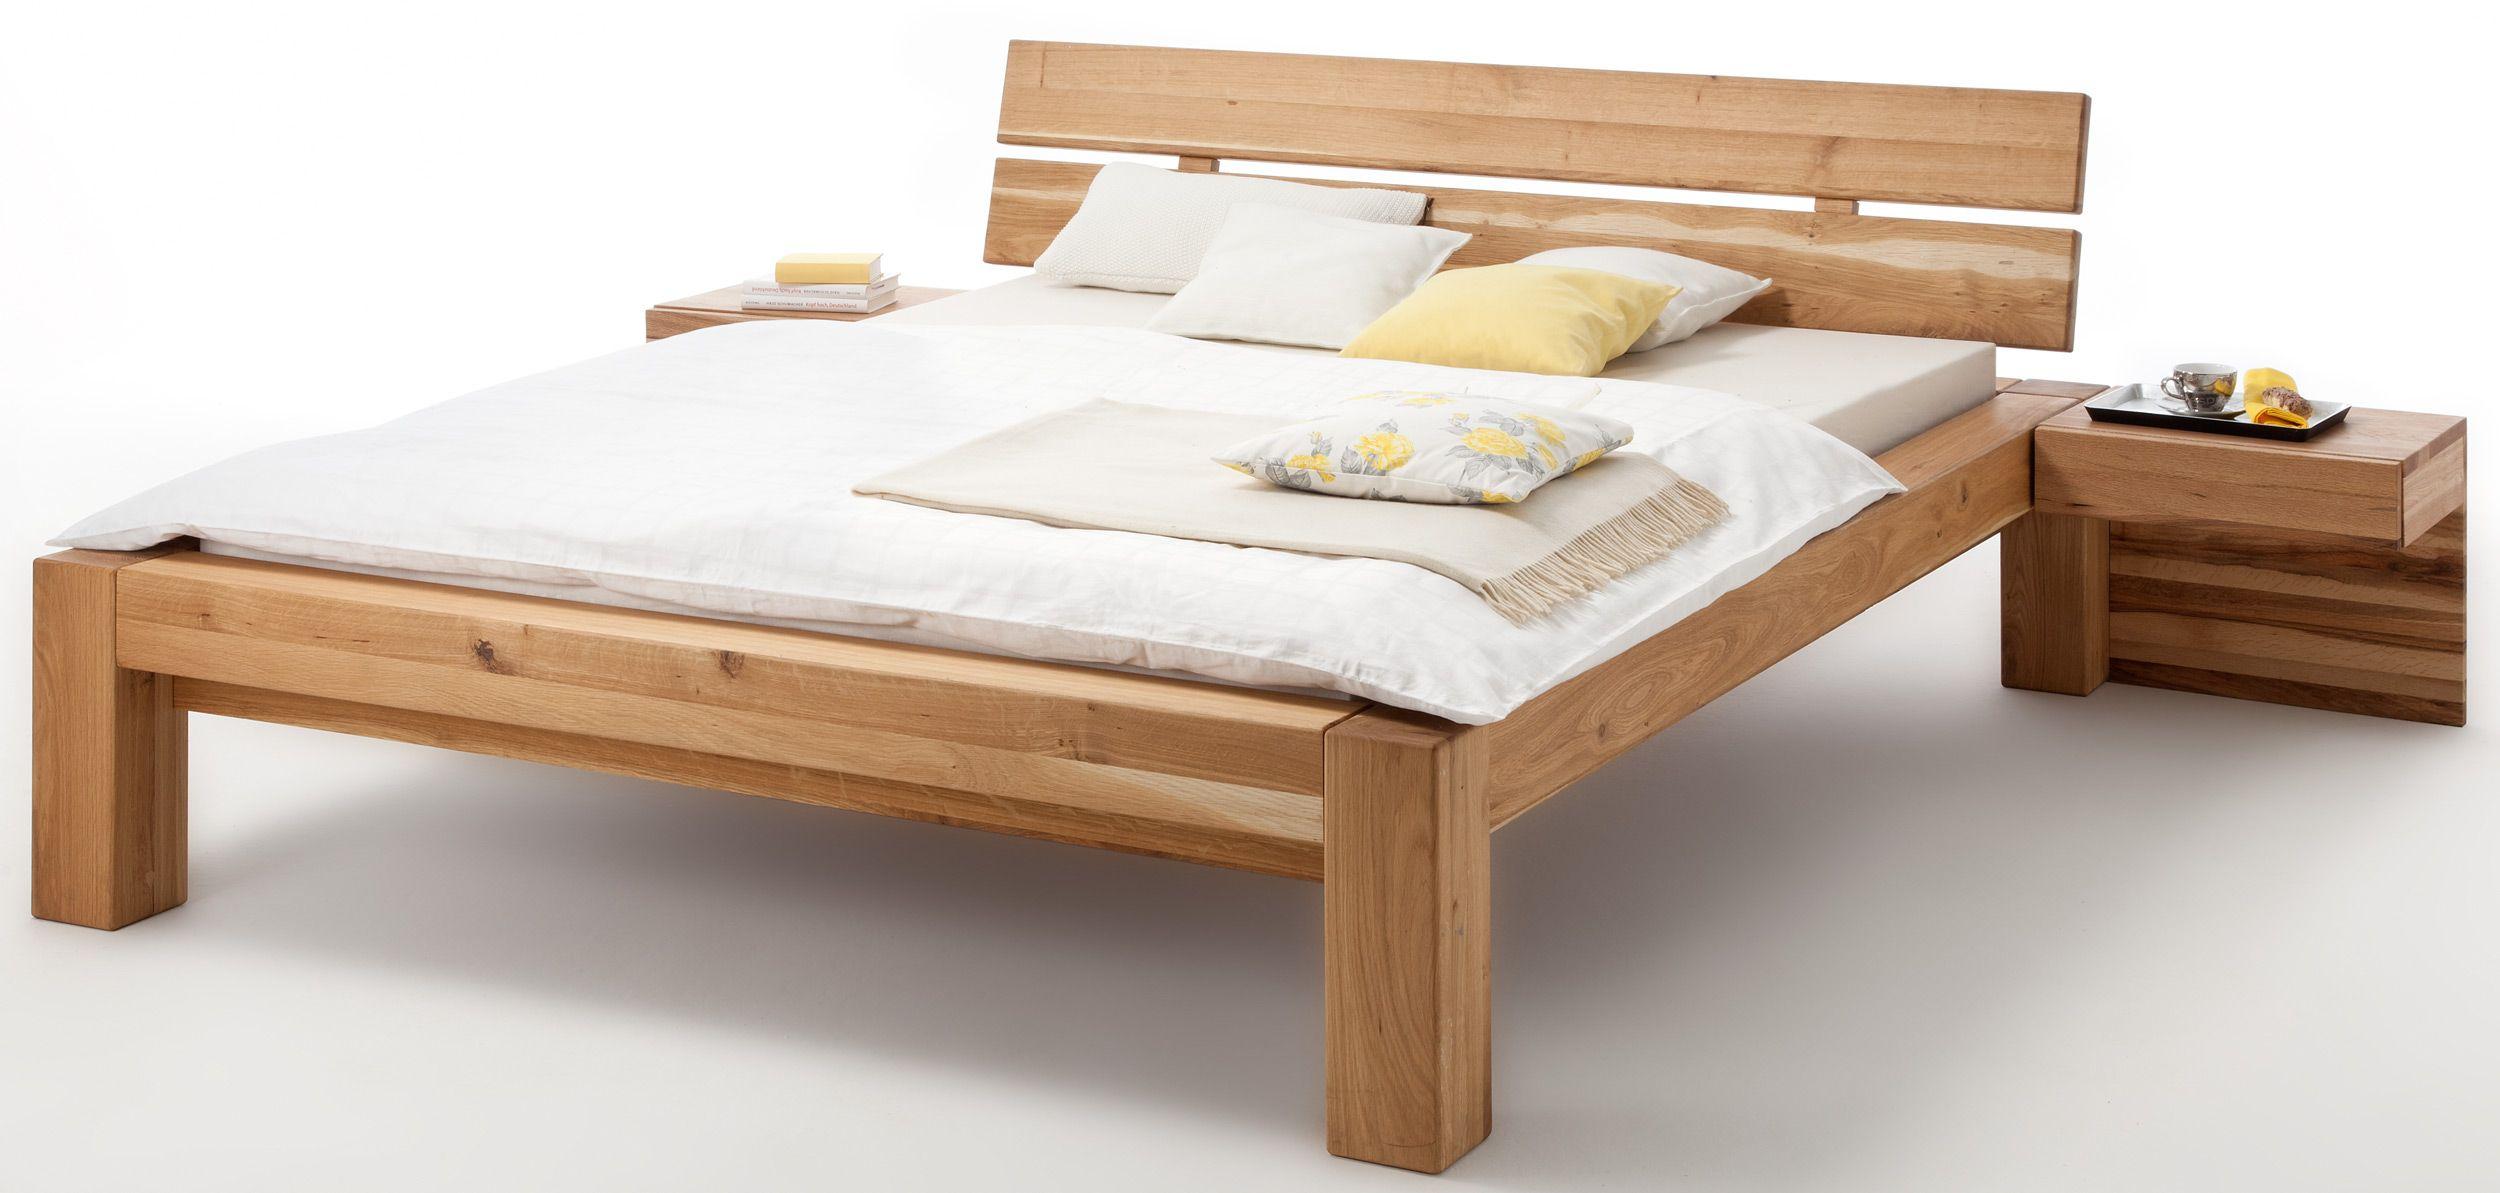 Besuche Den Beitrag Fur Mehr Info Bett 160x200 Bett Massivholz Haus Deko